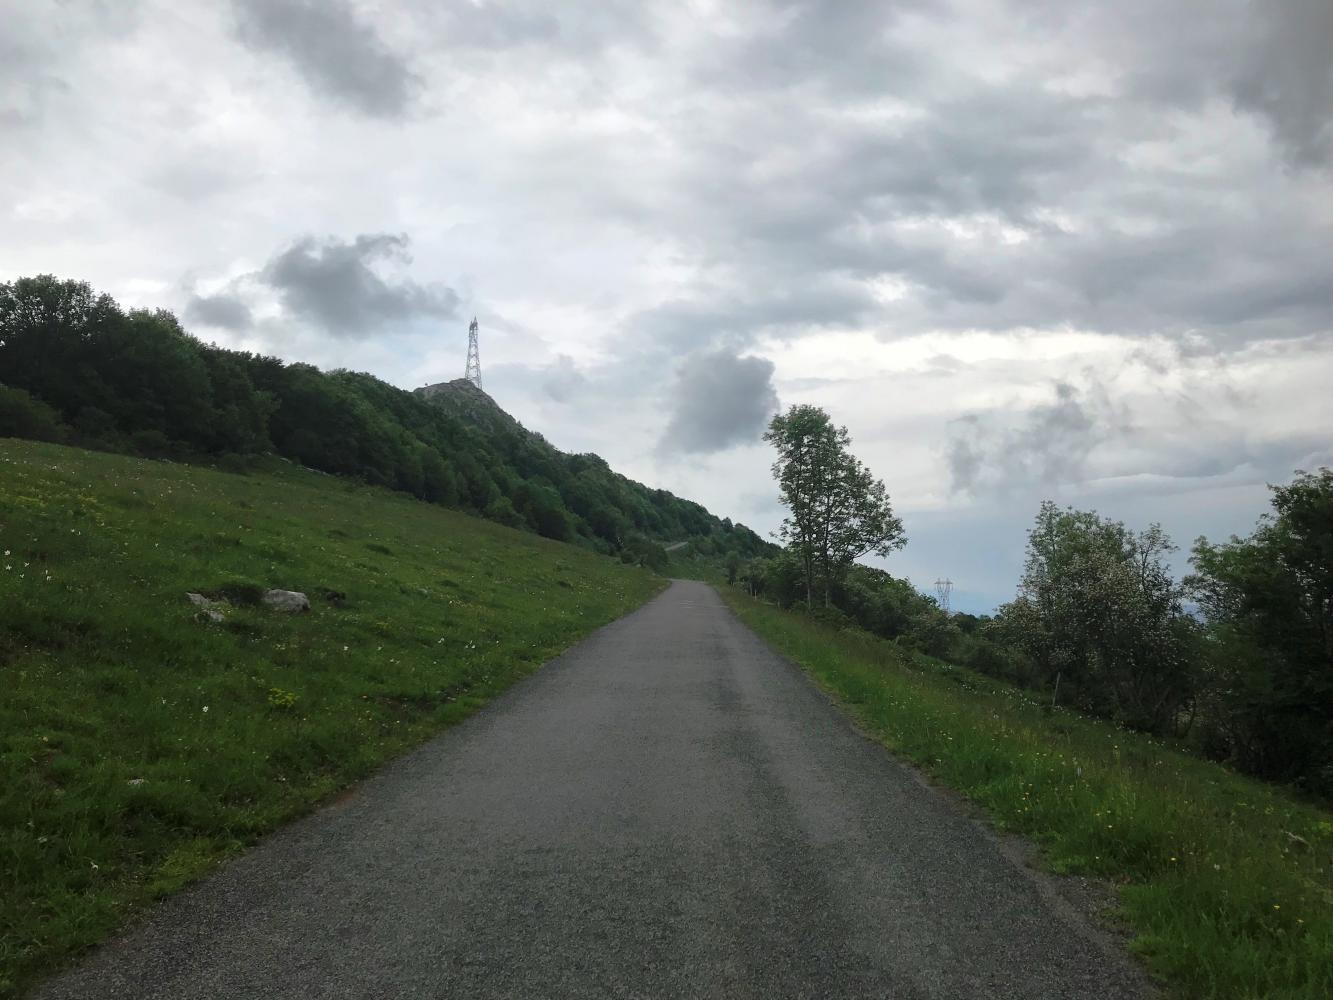 Col du Grand Colombiere - Anglefort Bike Climb - PJAMM Cycling